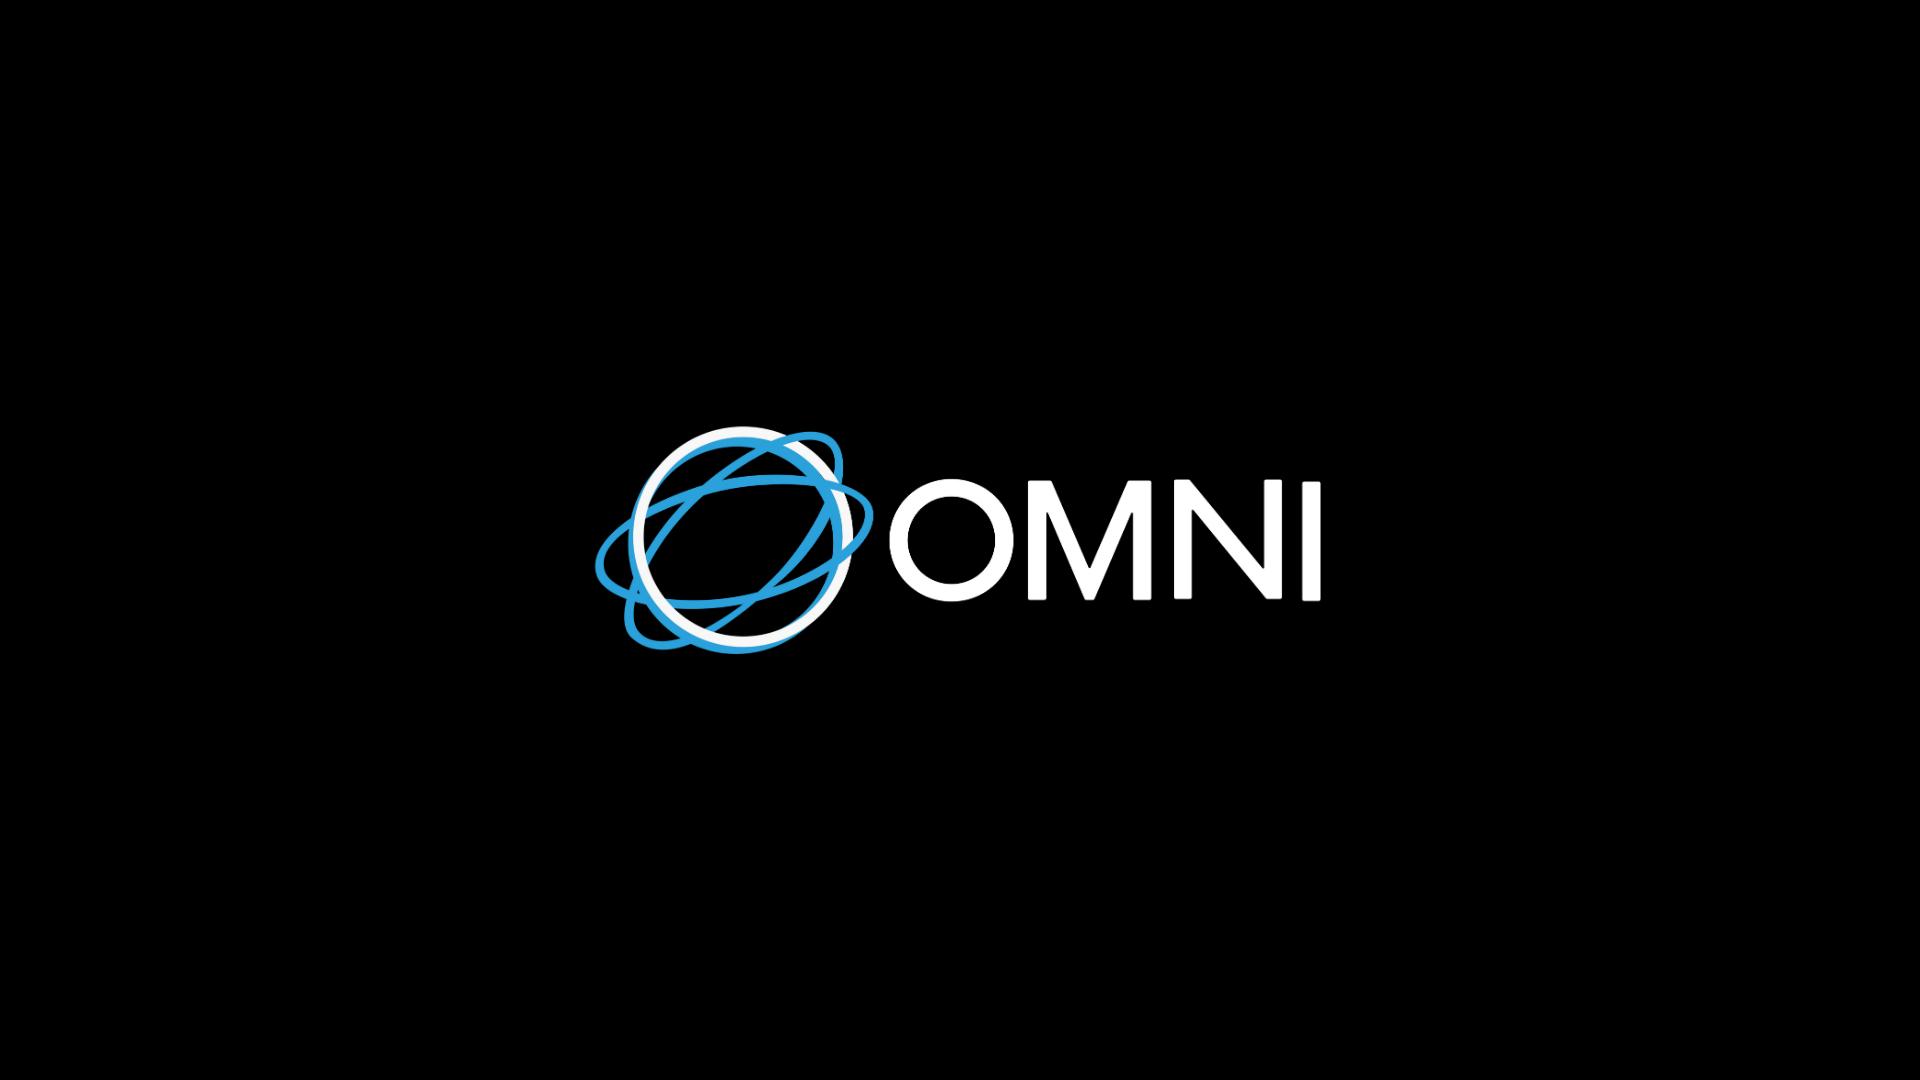 Omni Round-up Launch Video